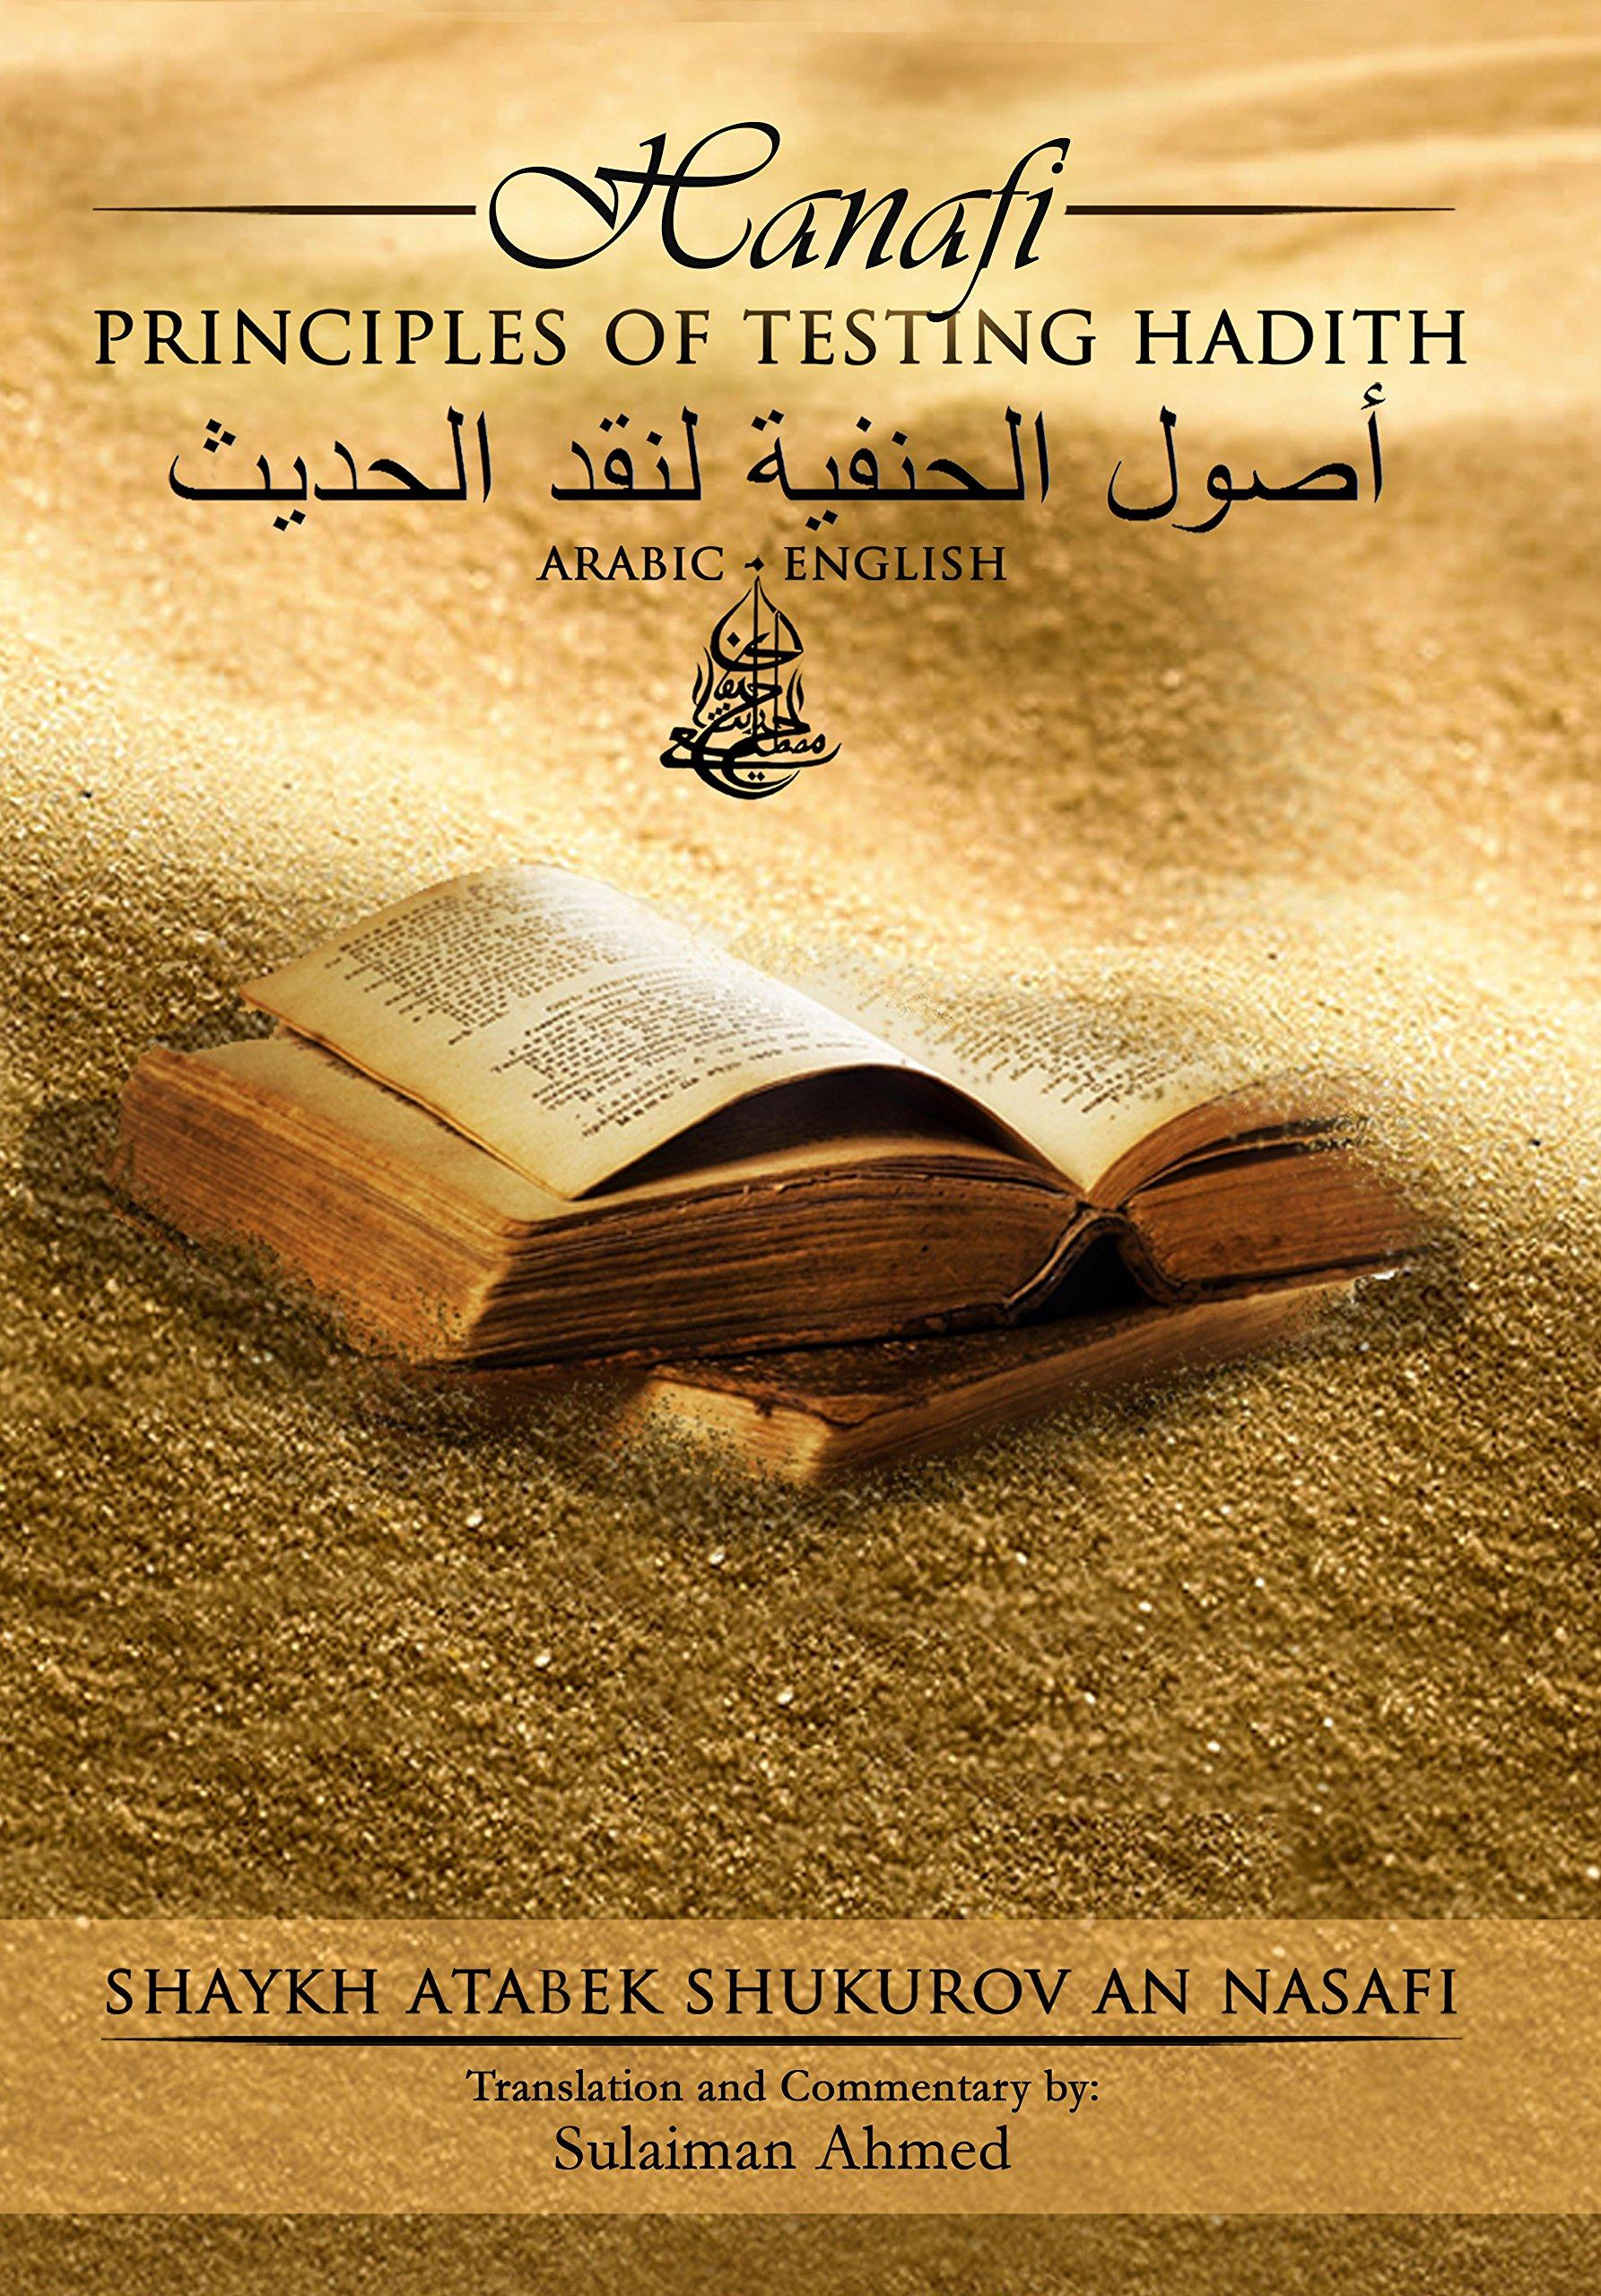 Hanafi Principles of Testing Hadith